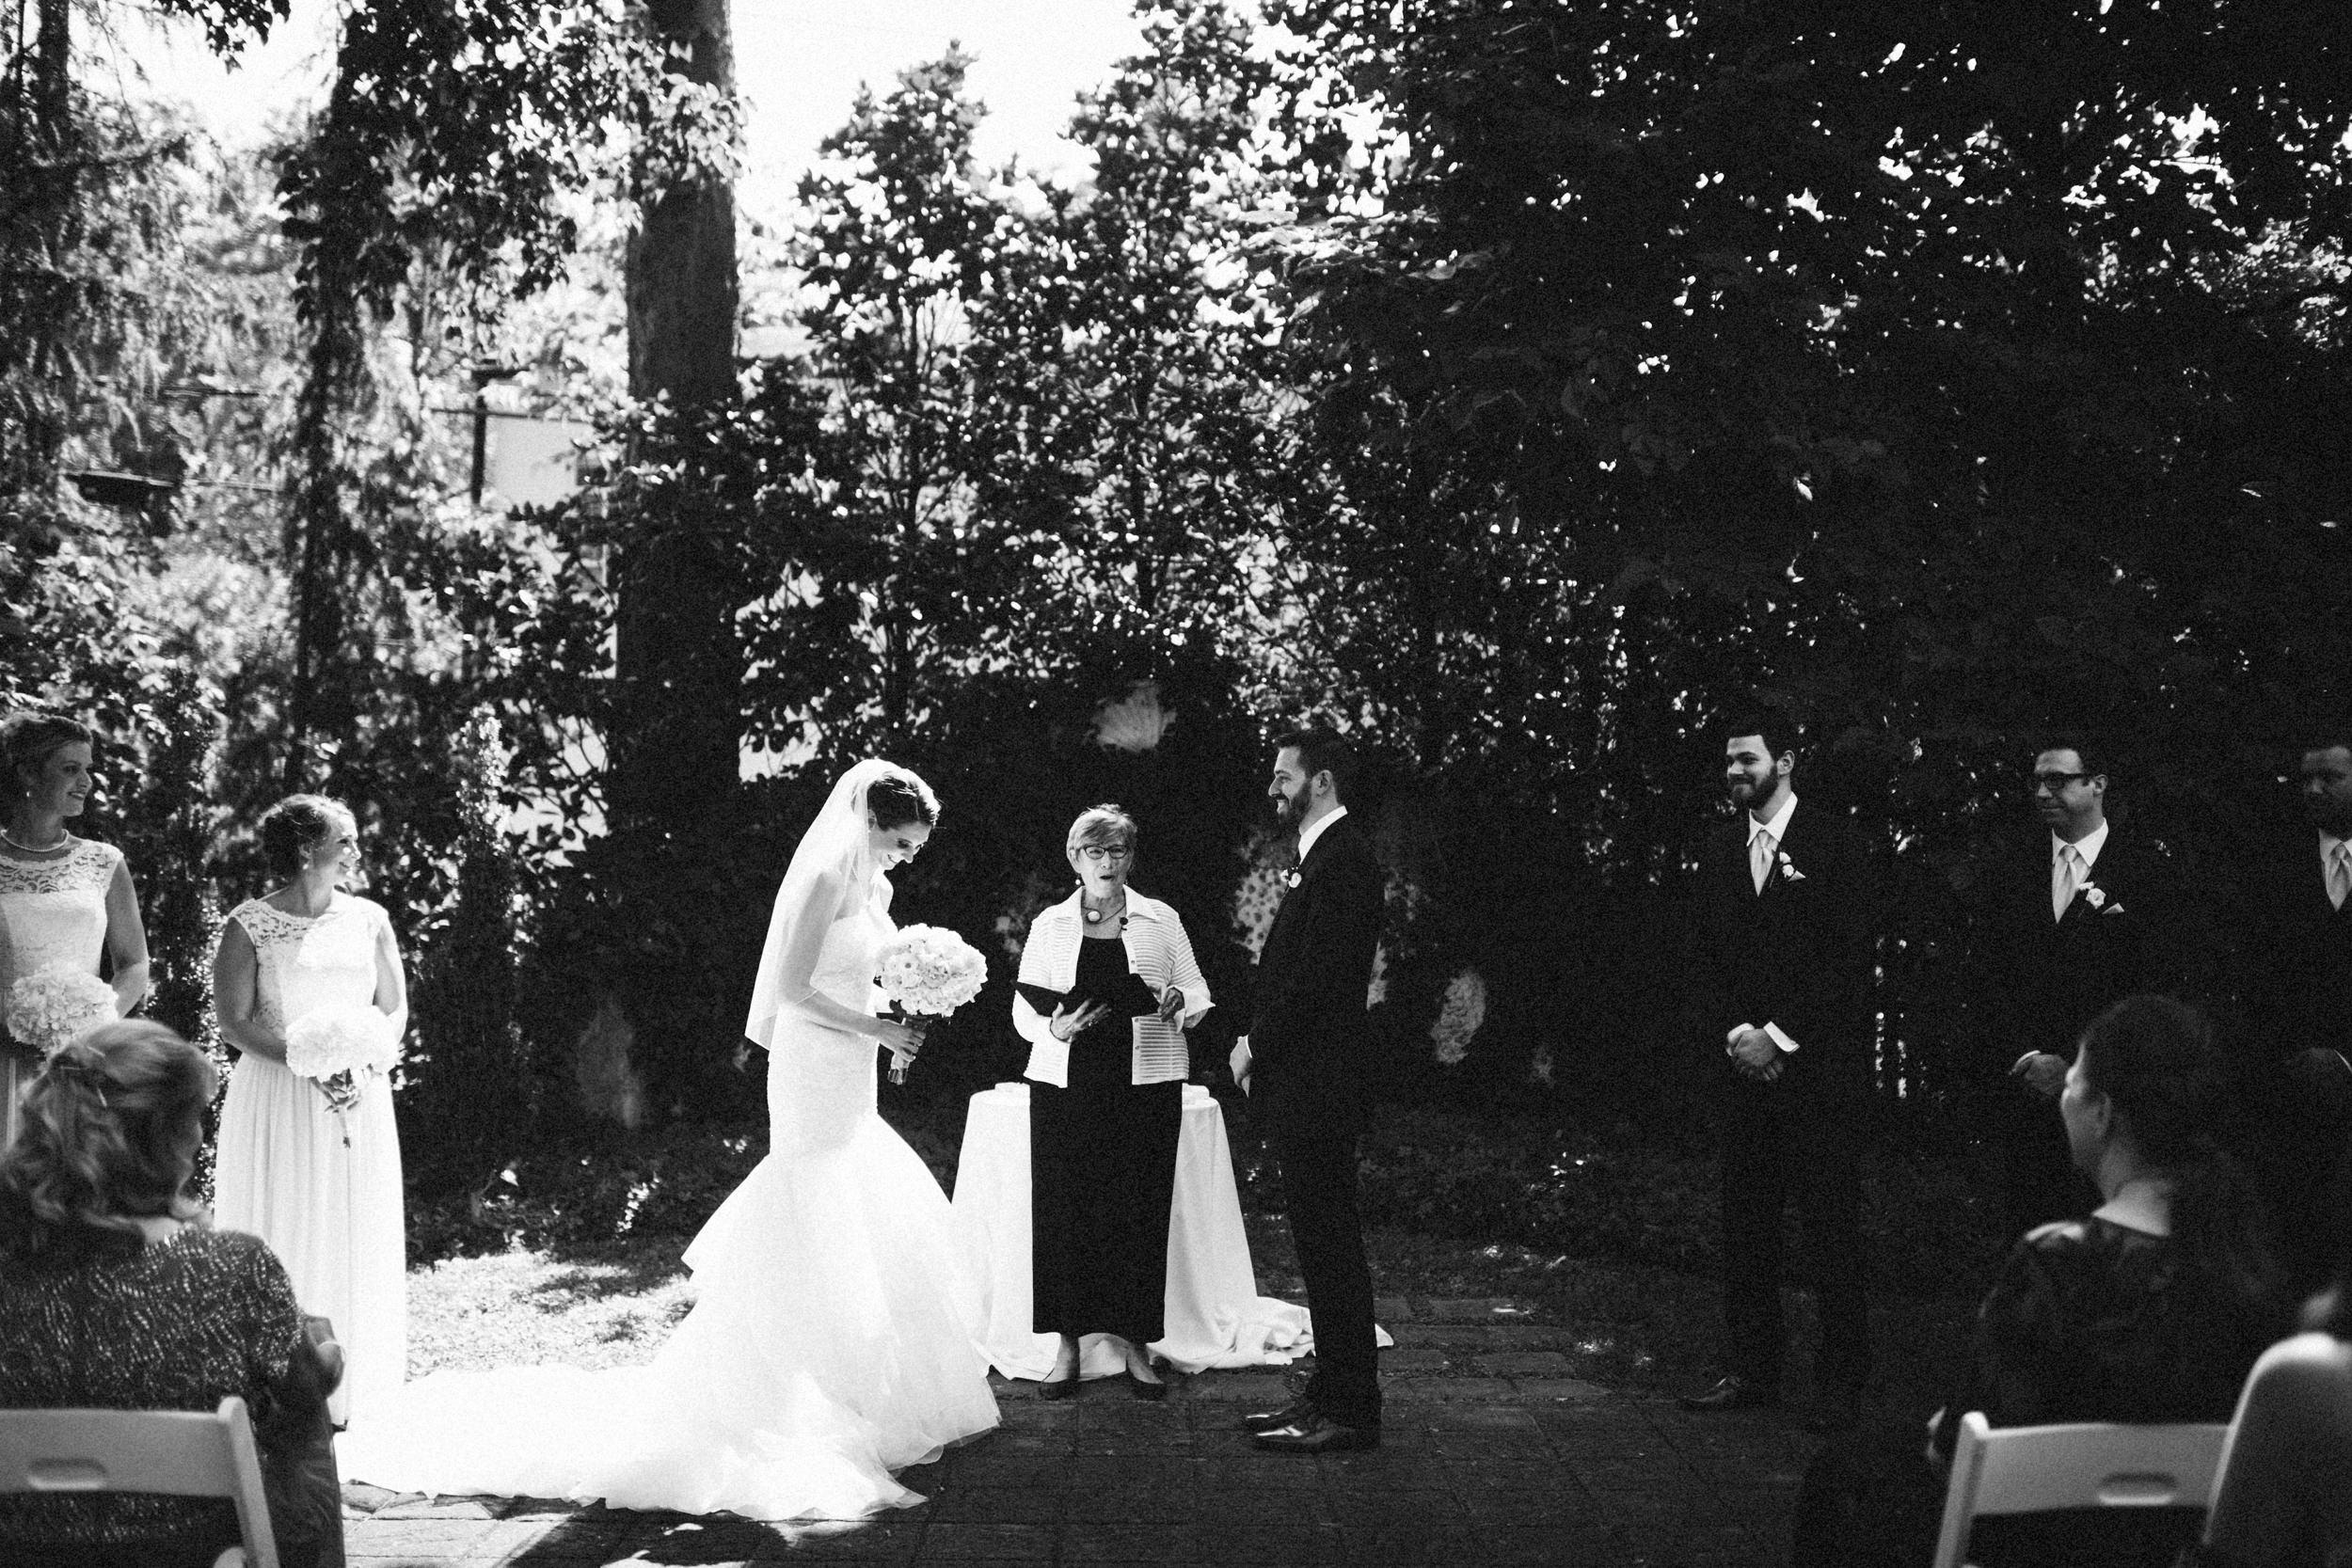 Louisville-Kentucky-Wedding-Elopement-Photographer-Sarah-Katherine-Davis-Photography-Whitehall-Classic-Timeless-Garden-Wedding-332.jpg